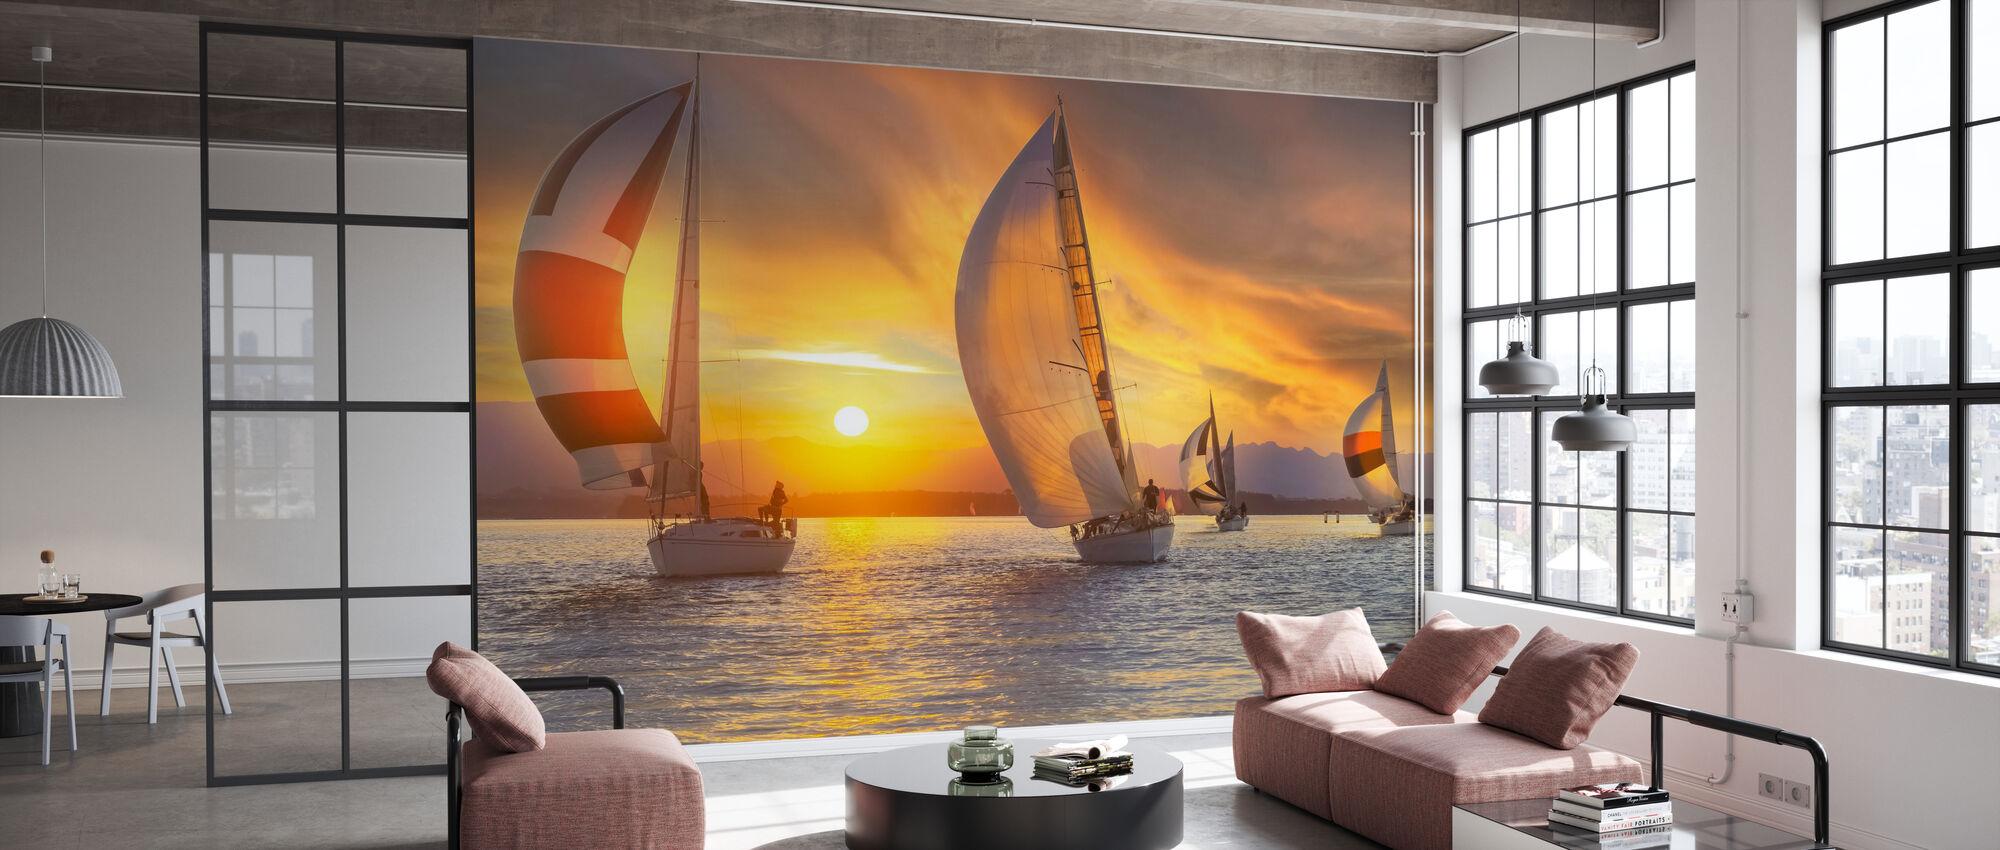 Sail Under the Sunset - Wallpaper - Office